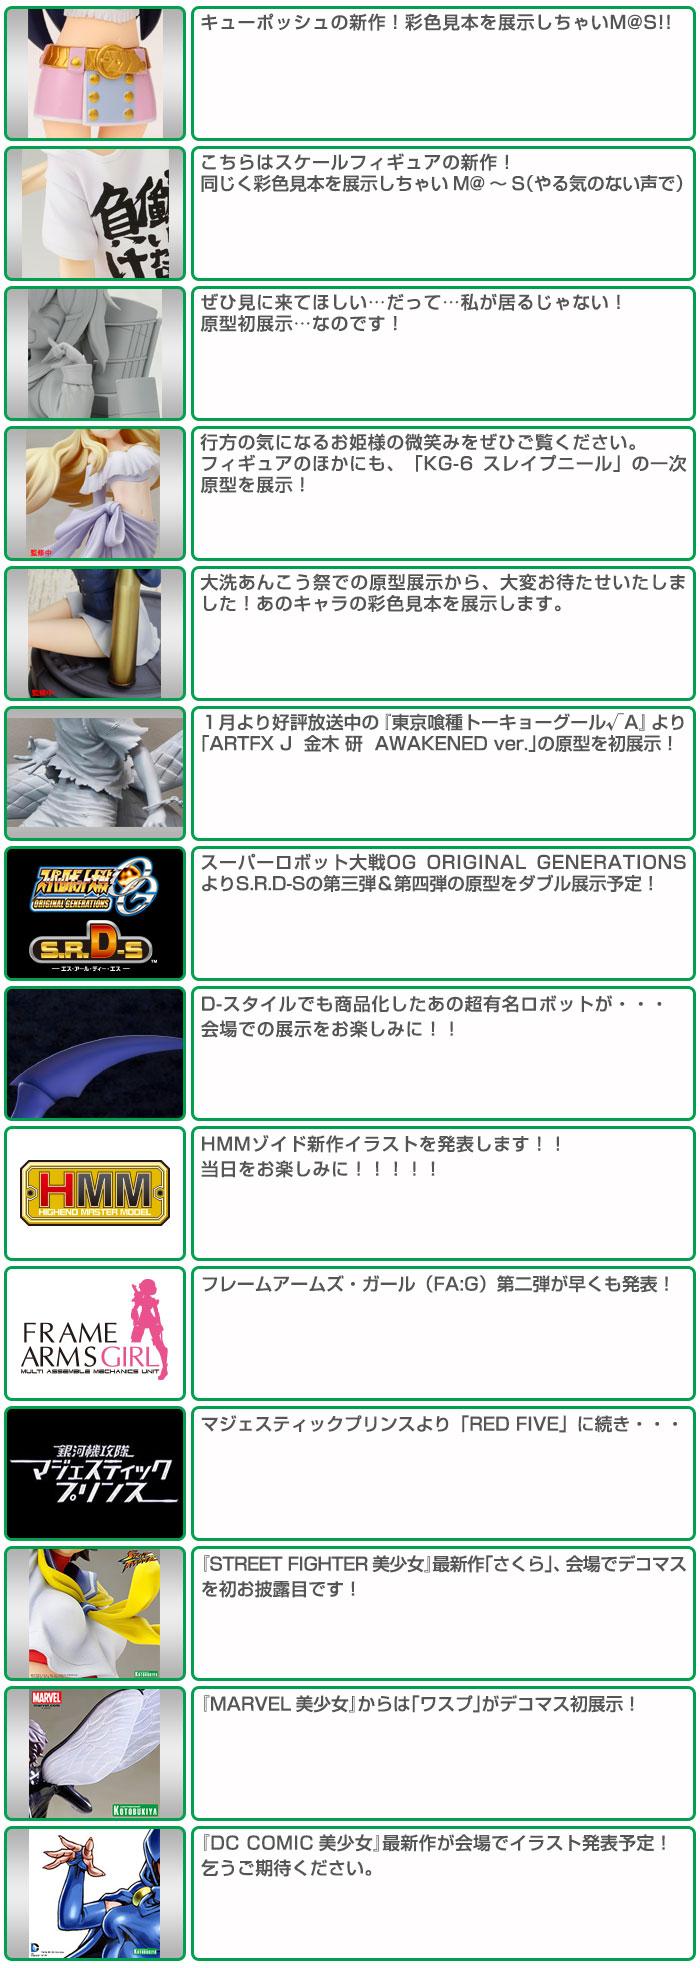 Kotobukiya Teases Fans with Wonder Festival 2015 Winter Previews haruhichan wonfes 2015 winter anime figures